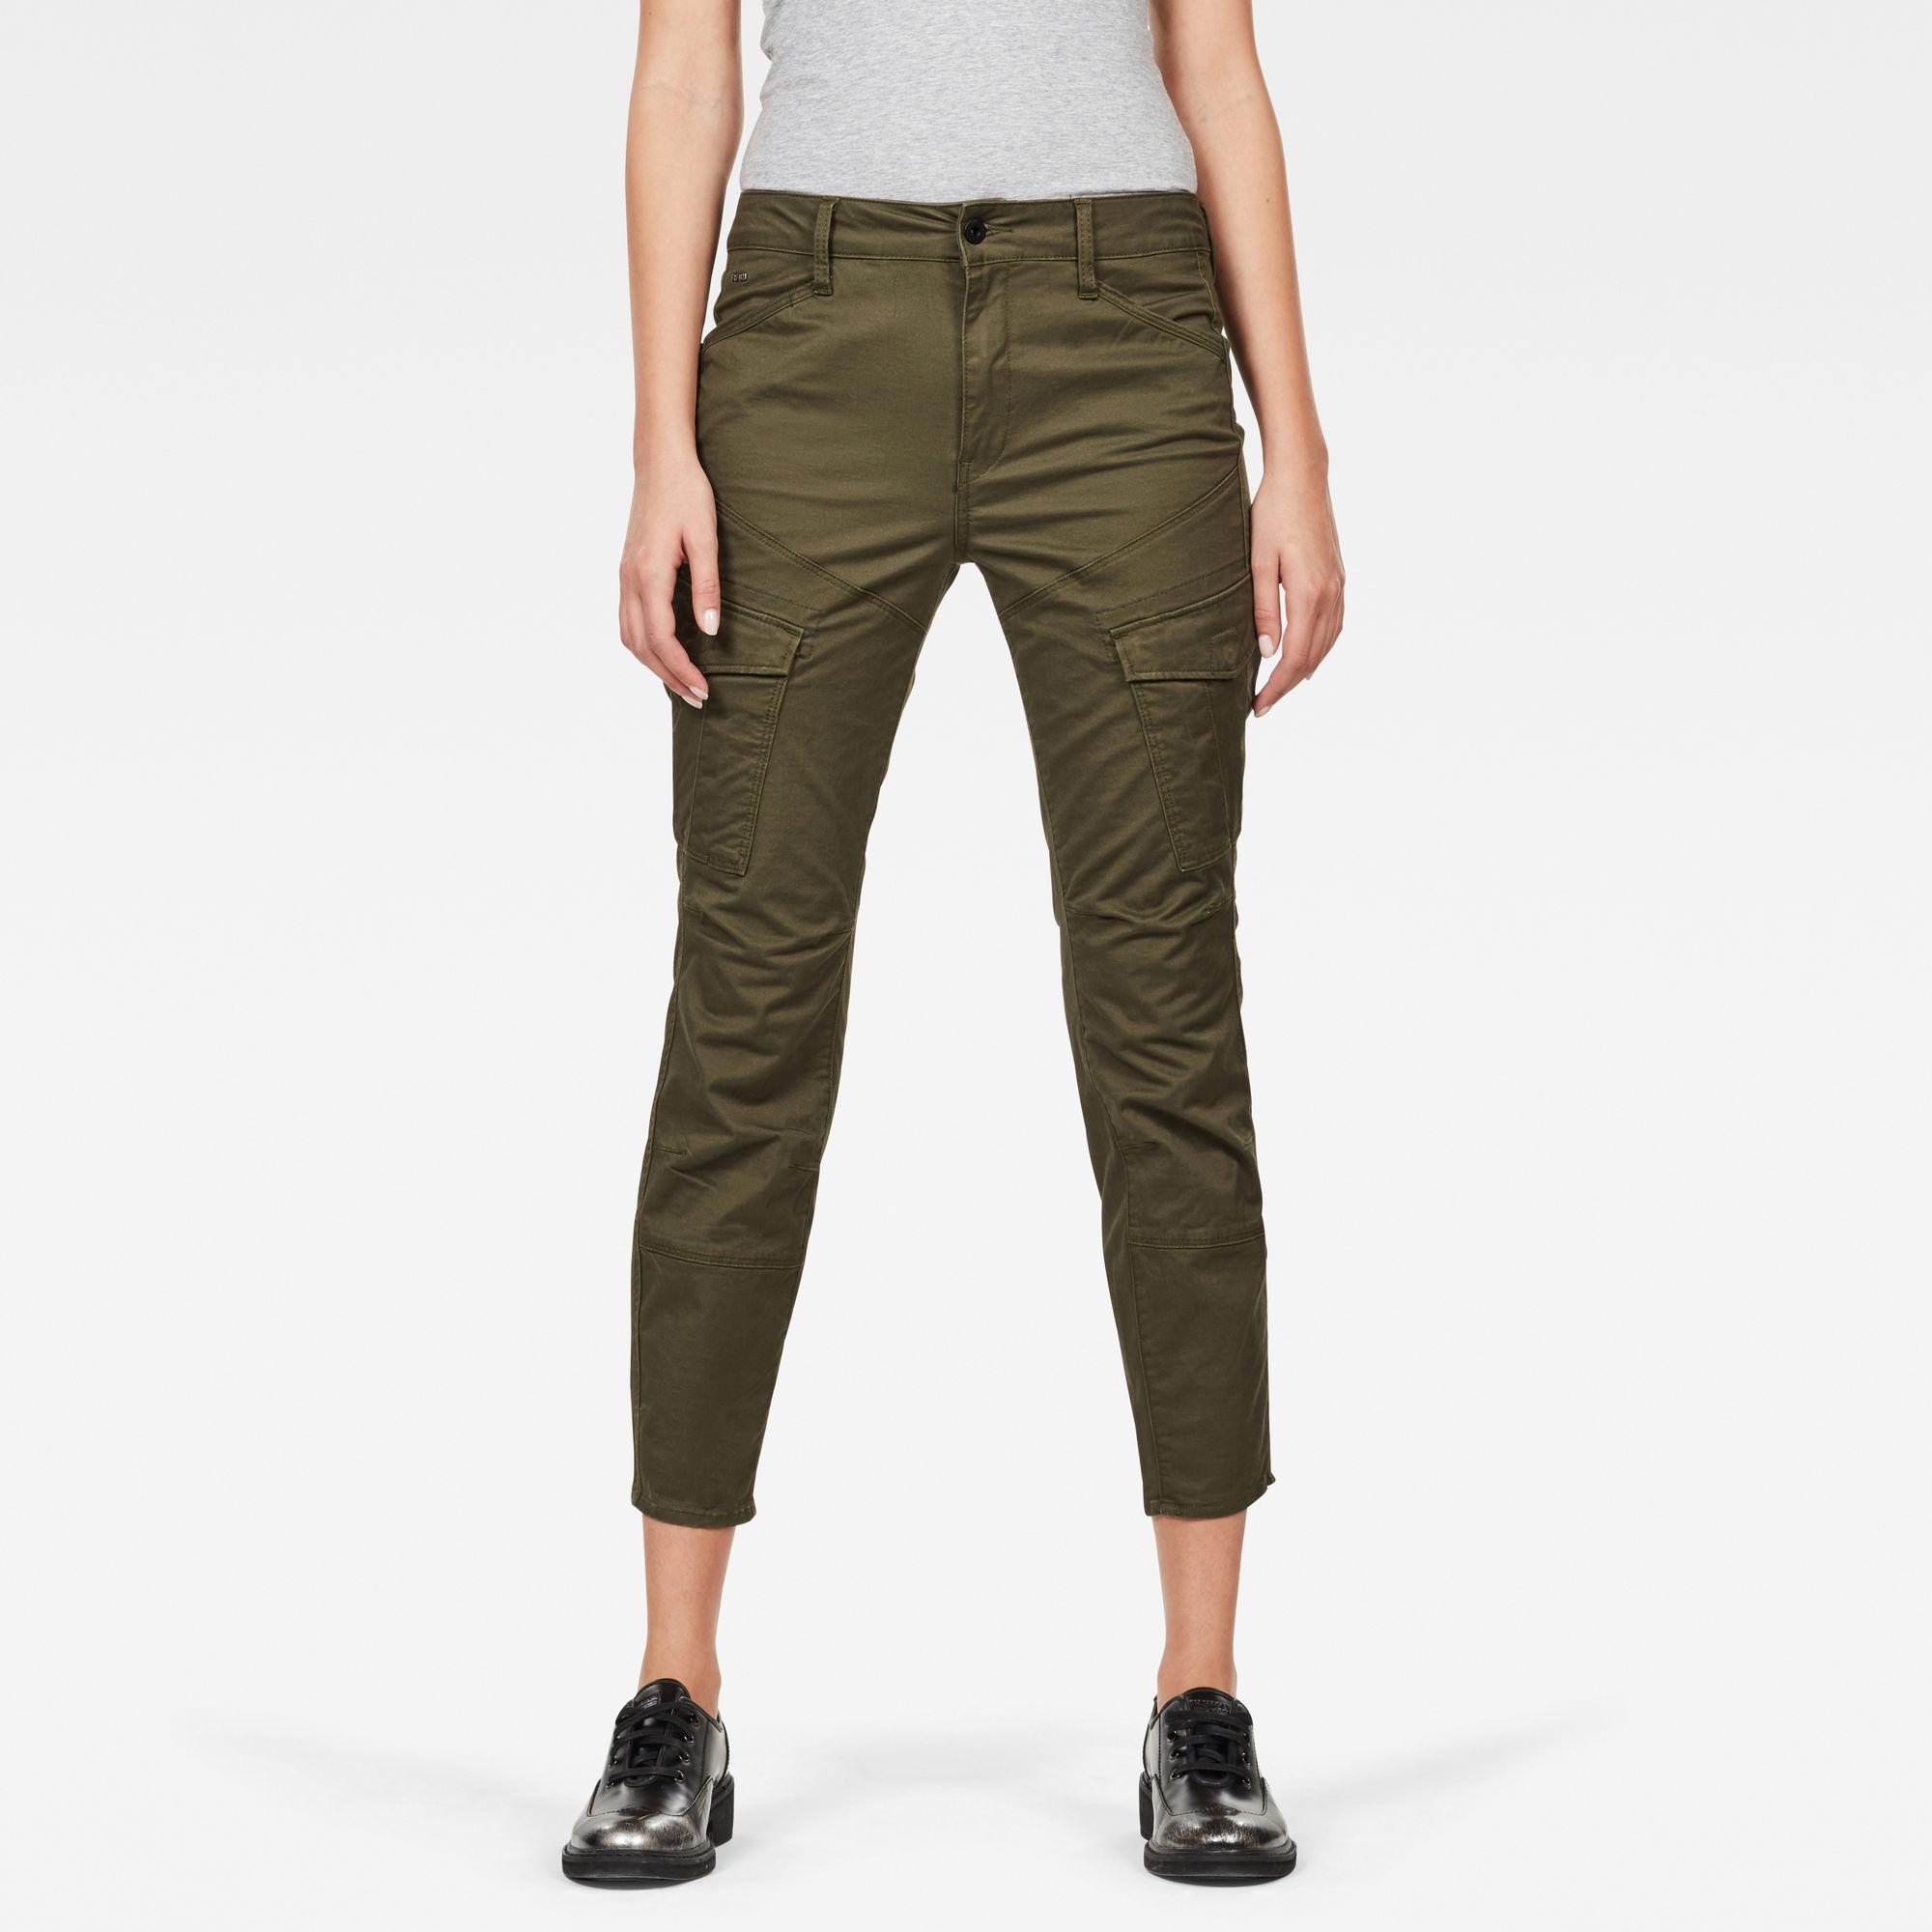 Rovic Mid Waist Skinny Cargo Pants